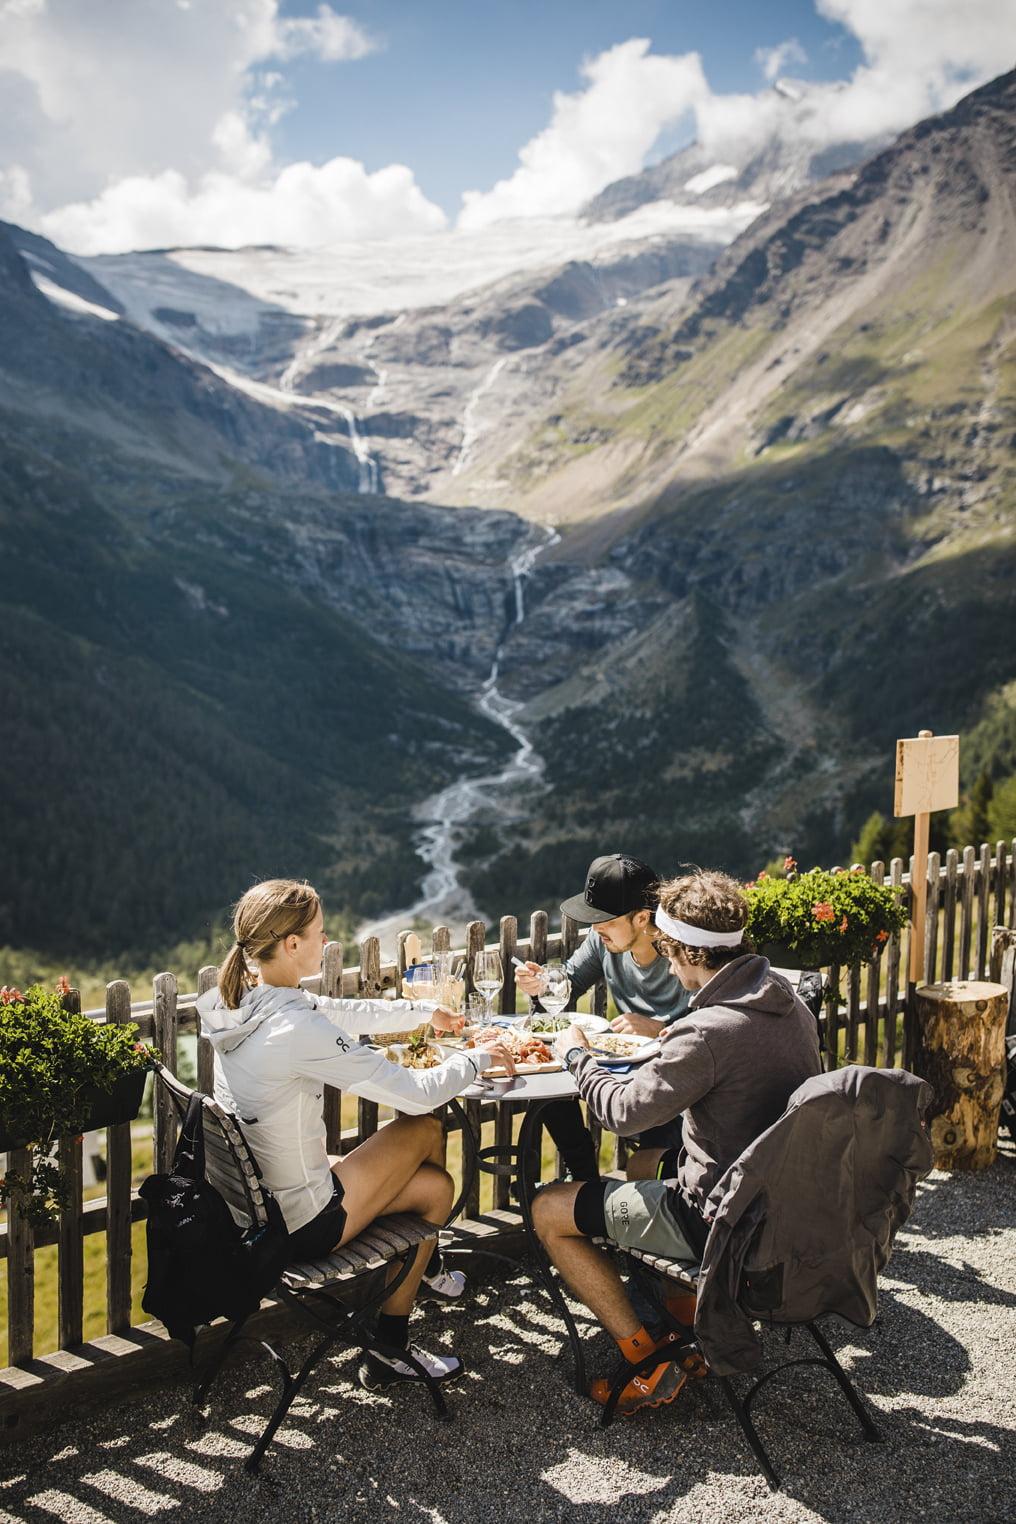 Julia Bleasdale  - Trailrunning Bernina